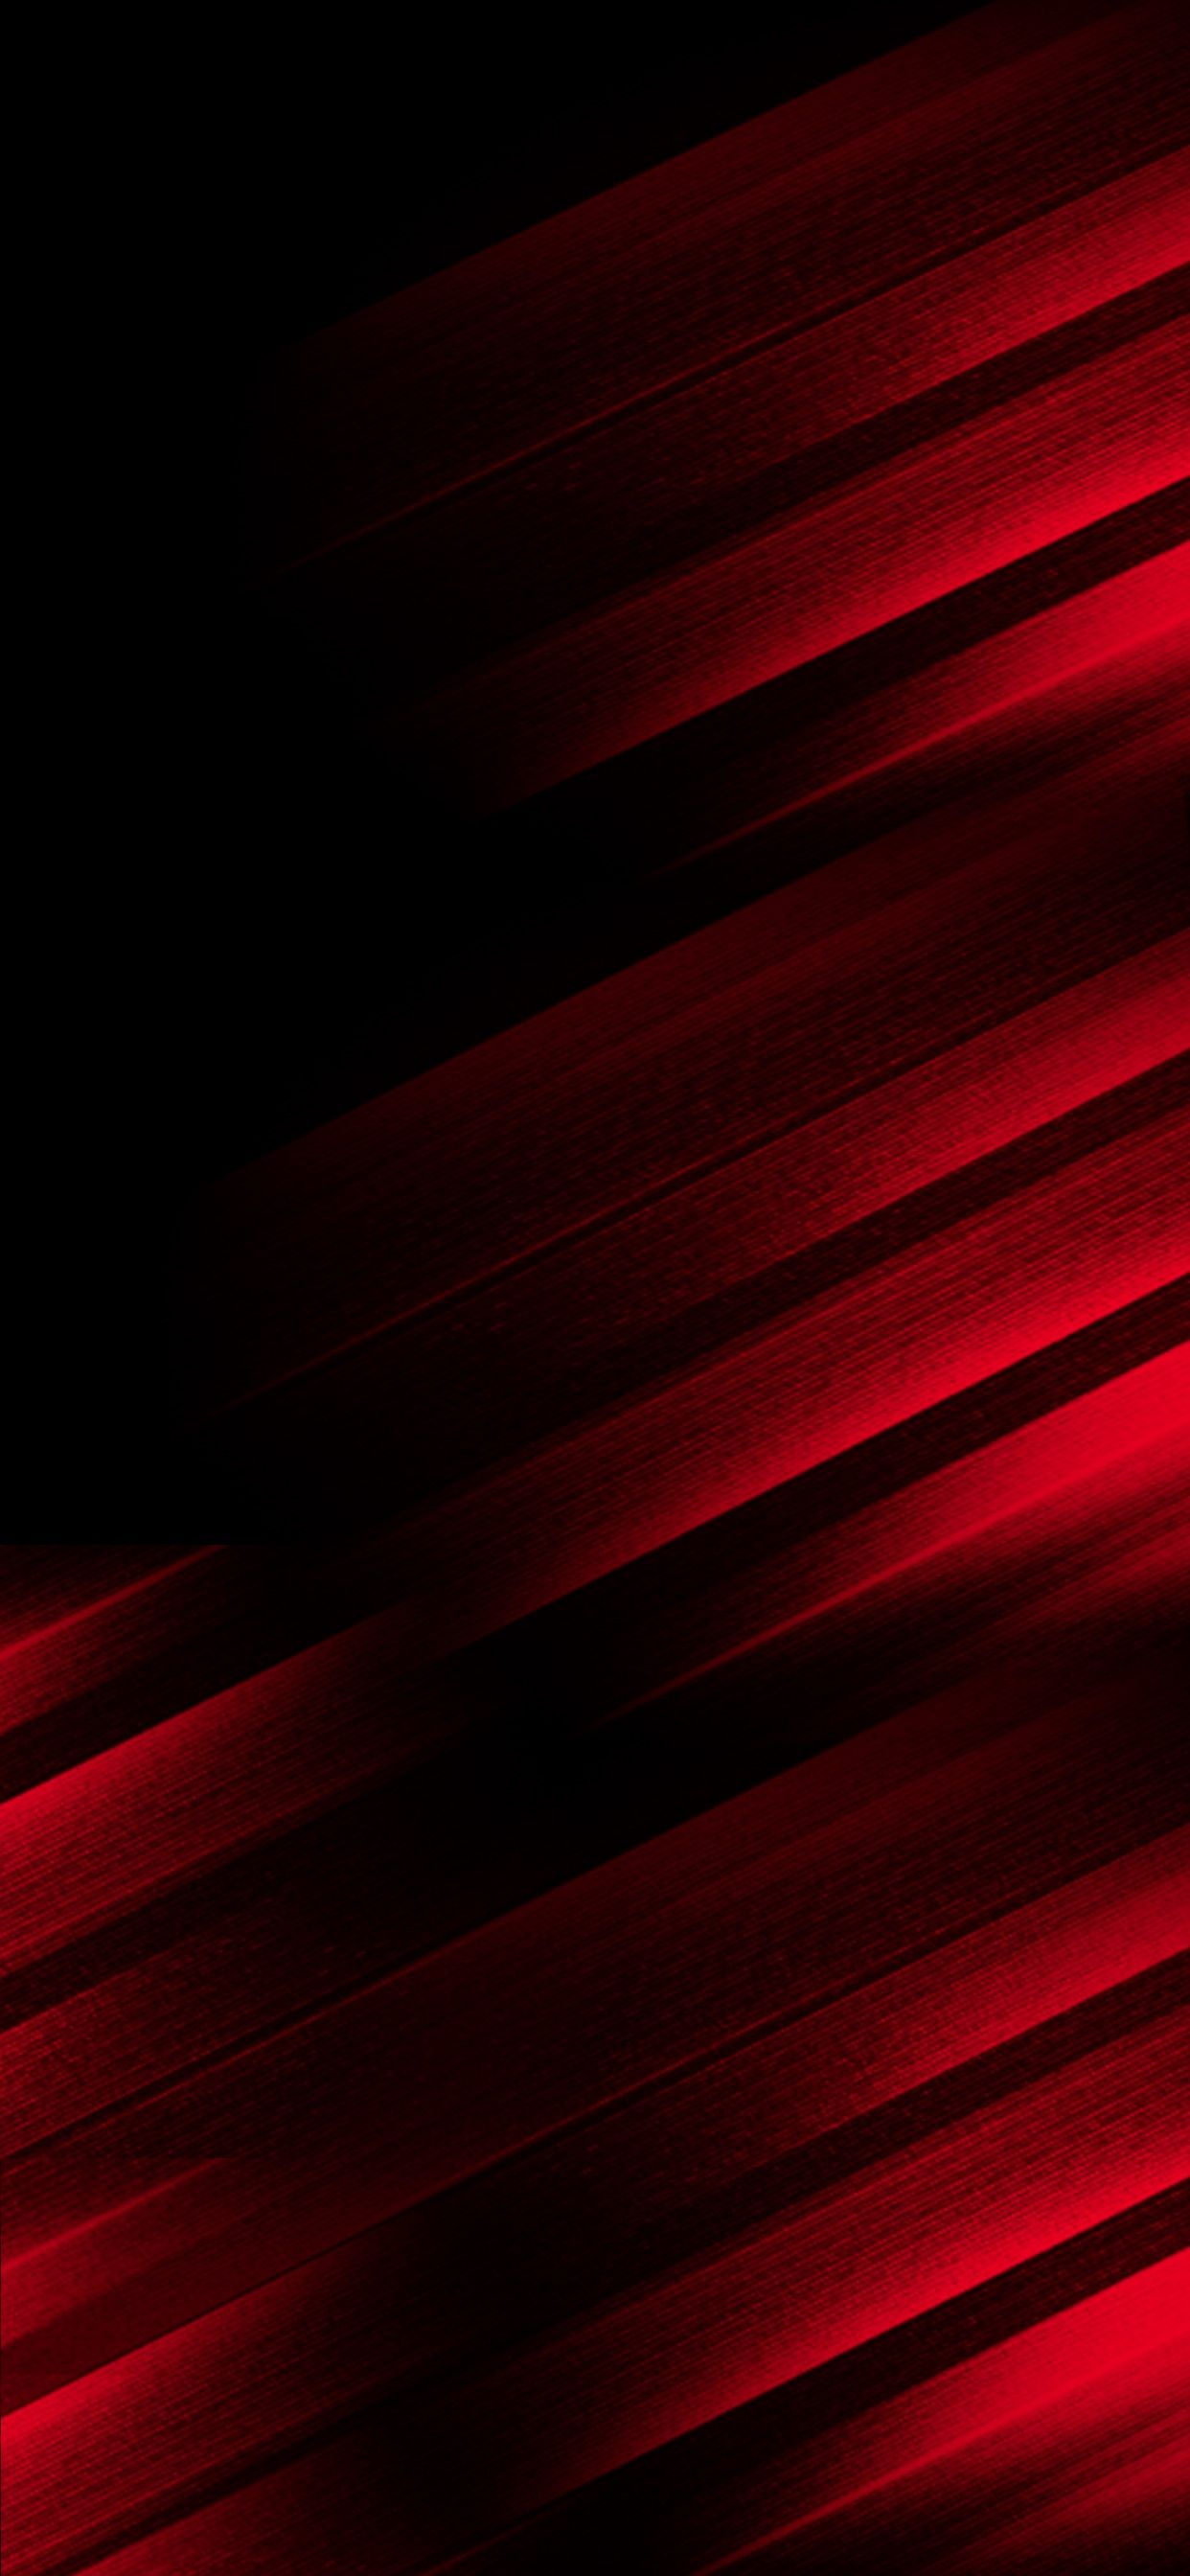 New Wallpaper Designed By C Hotspot4u Graphic Wallpaper Glitter Wallpaper Red And Black Wallpaper